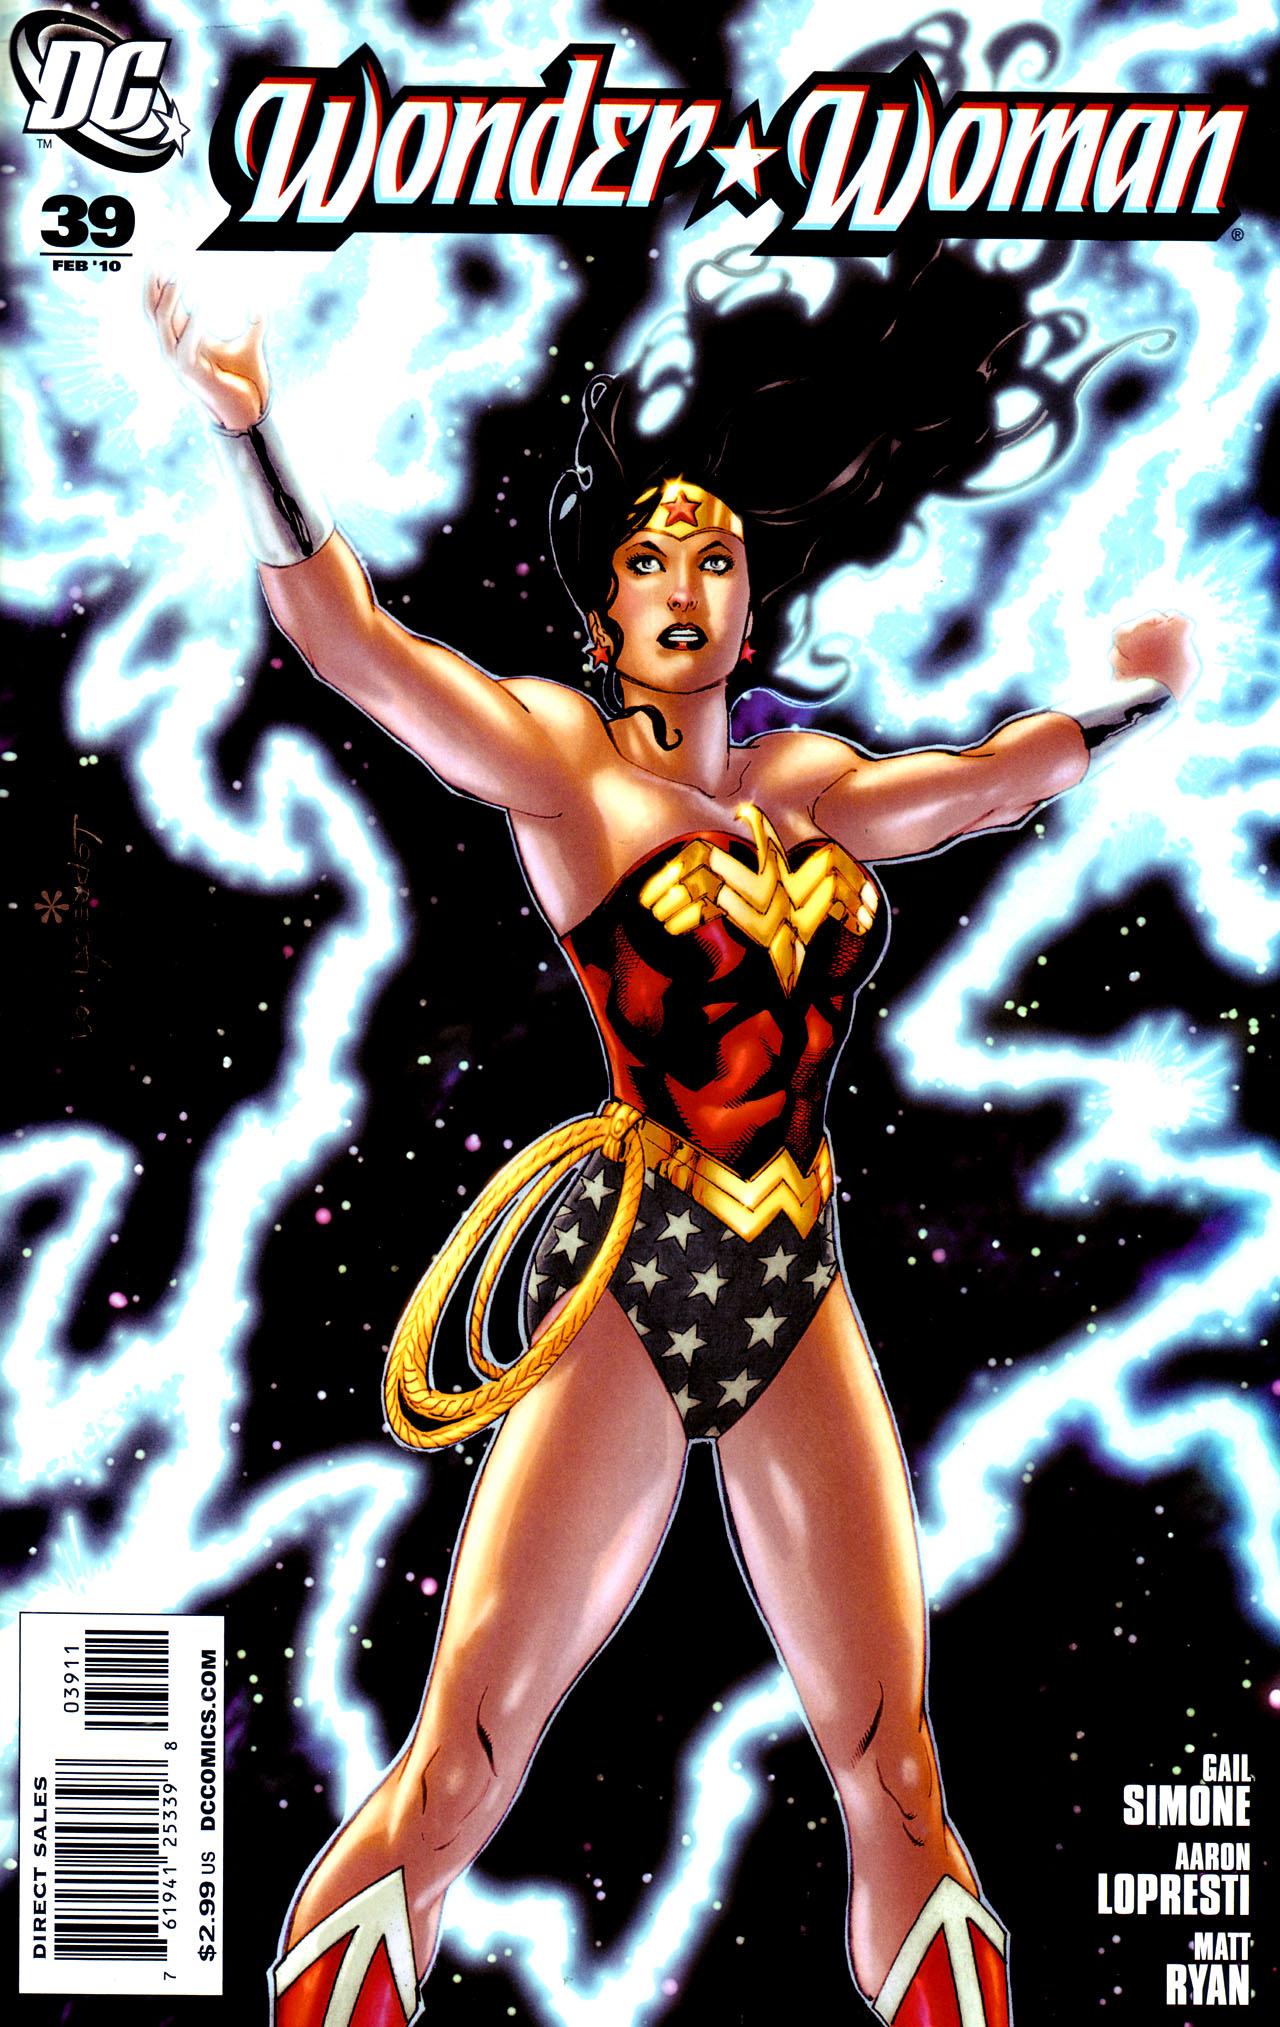 Read online Wonder Woman (2006) comic -  Issue #39 - 1